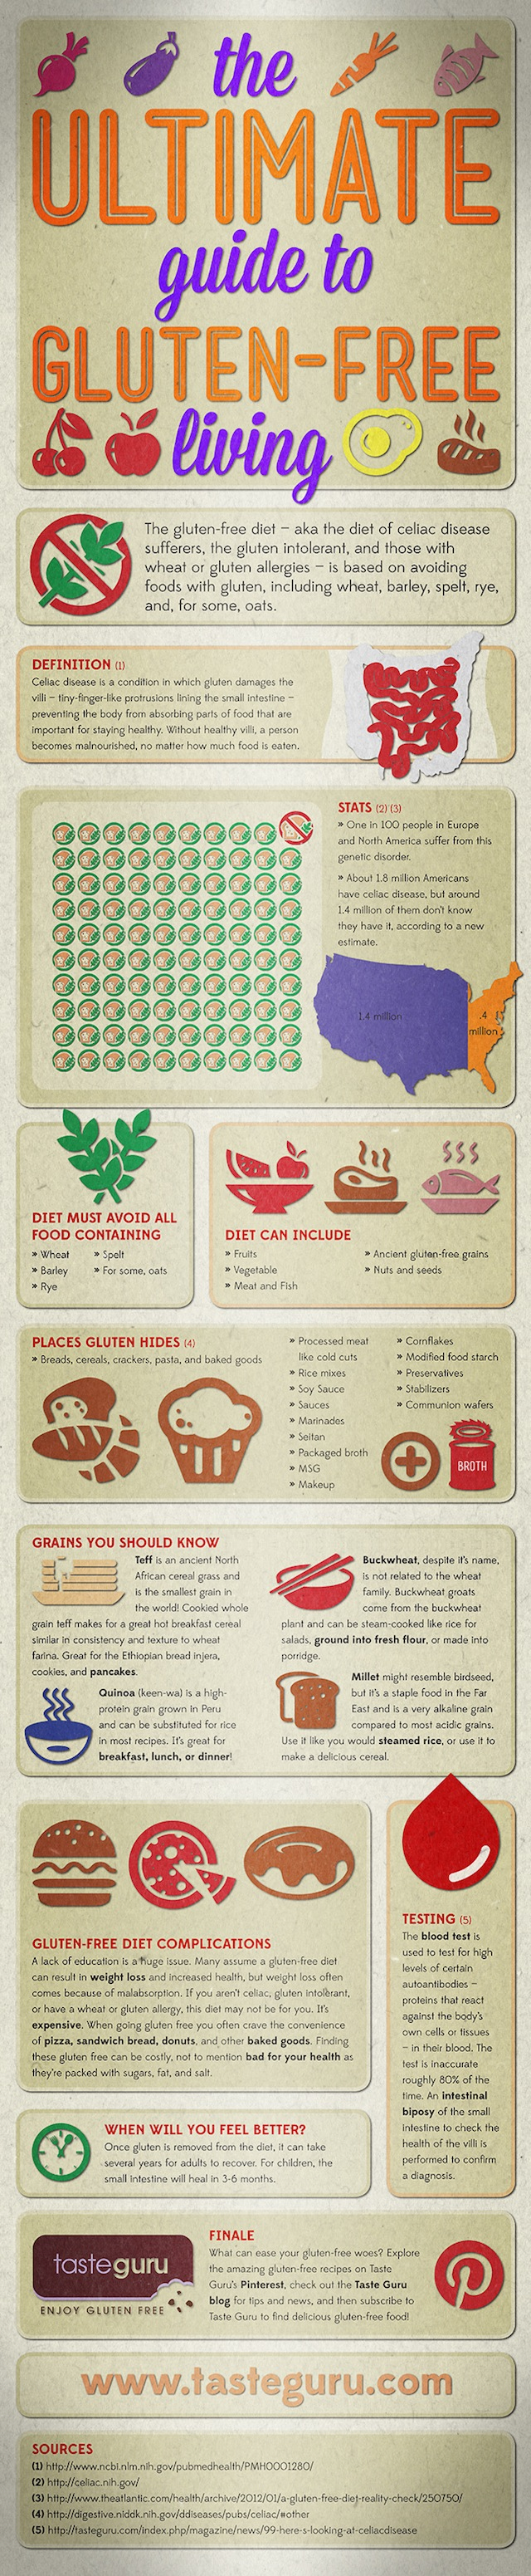 Gluten-Free Living Tips Infographic